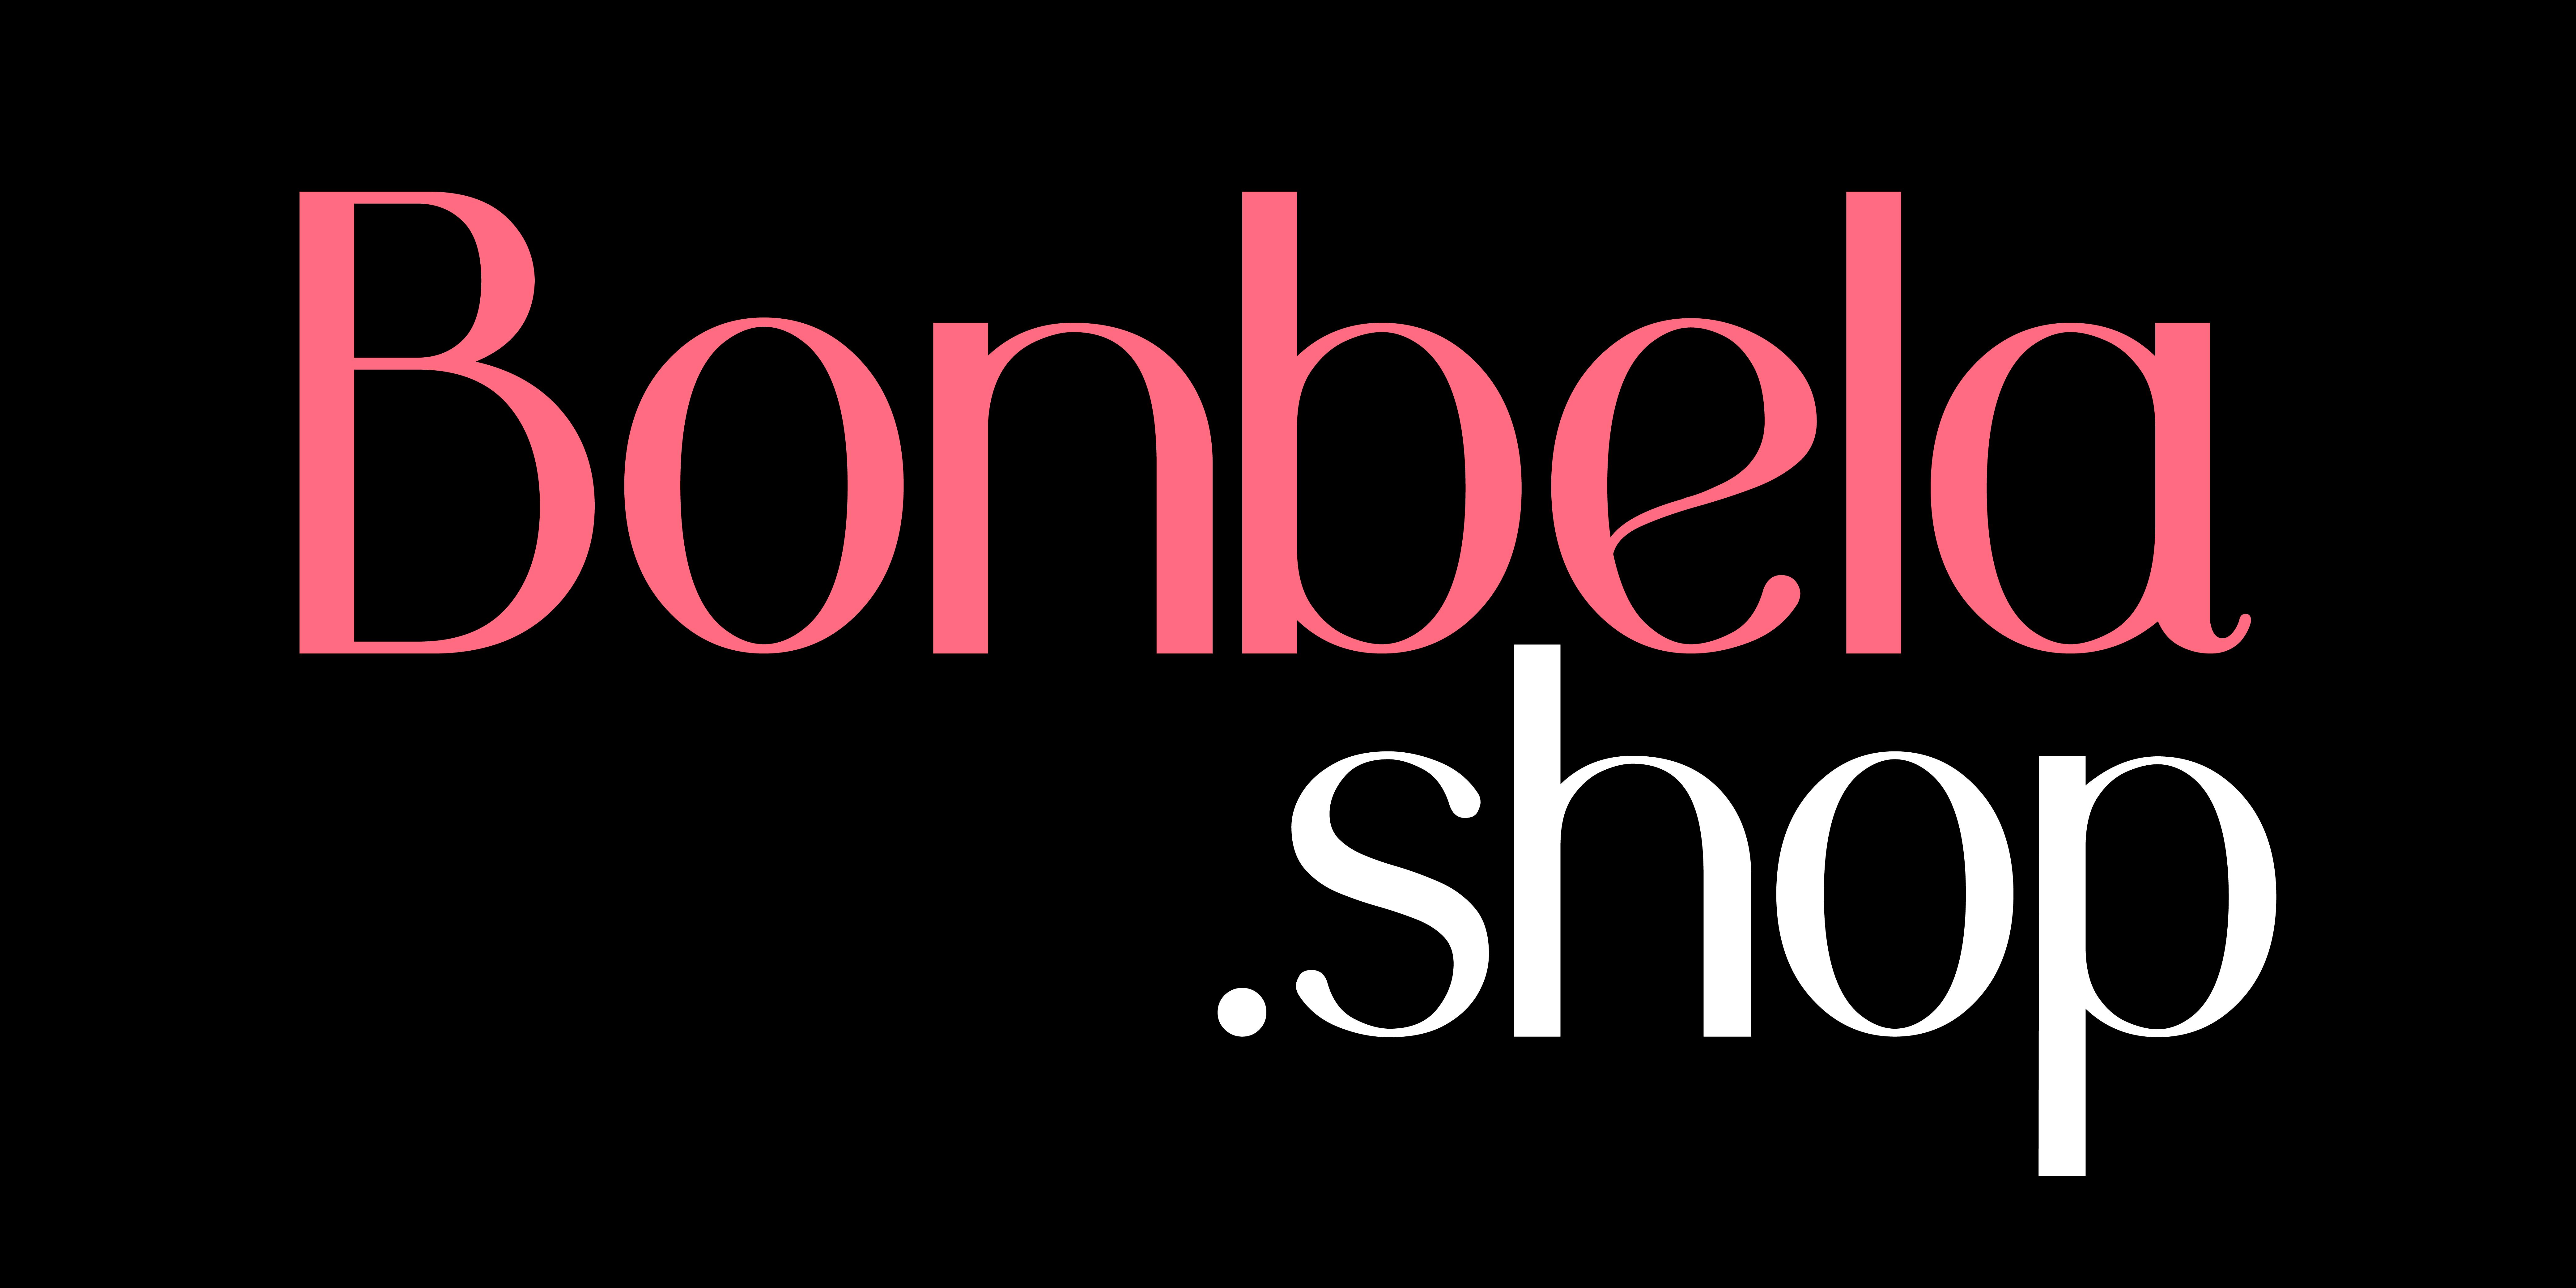 Bonbela Shop Celebrates Their Official Launch With A Range Of Silk Sarees